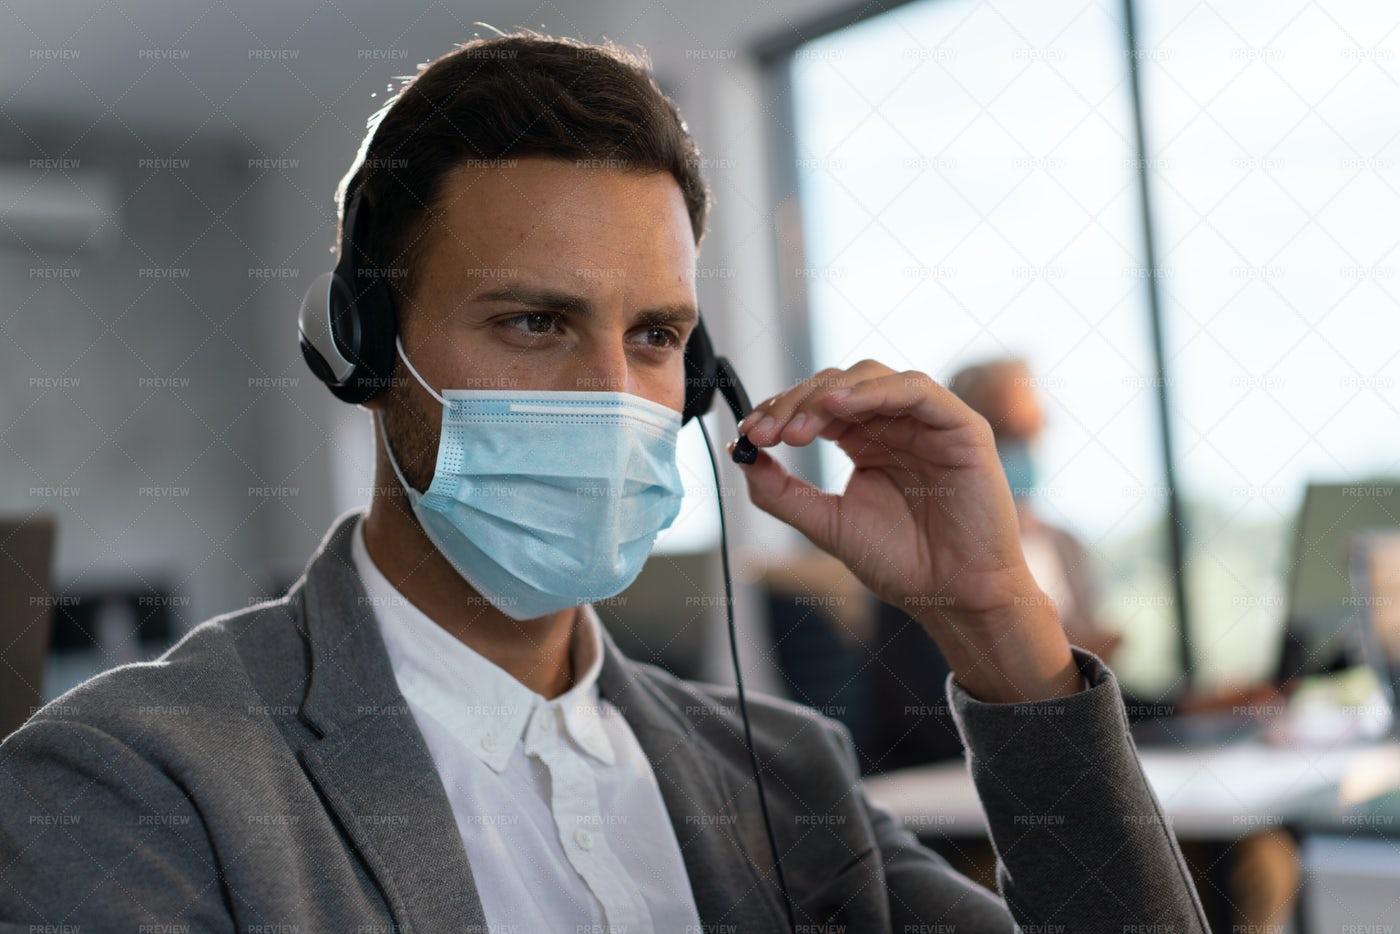 Call Center Agent During Pandemic: Stock Photos